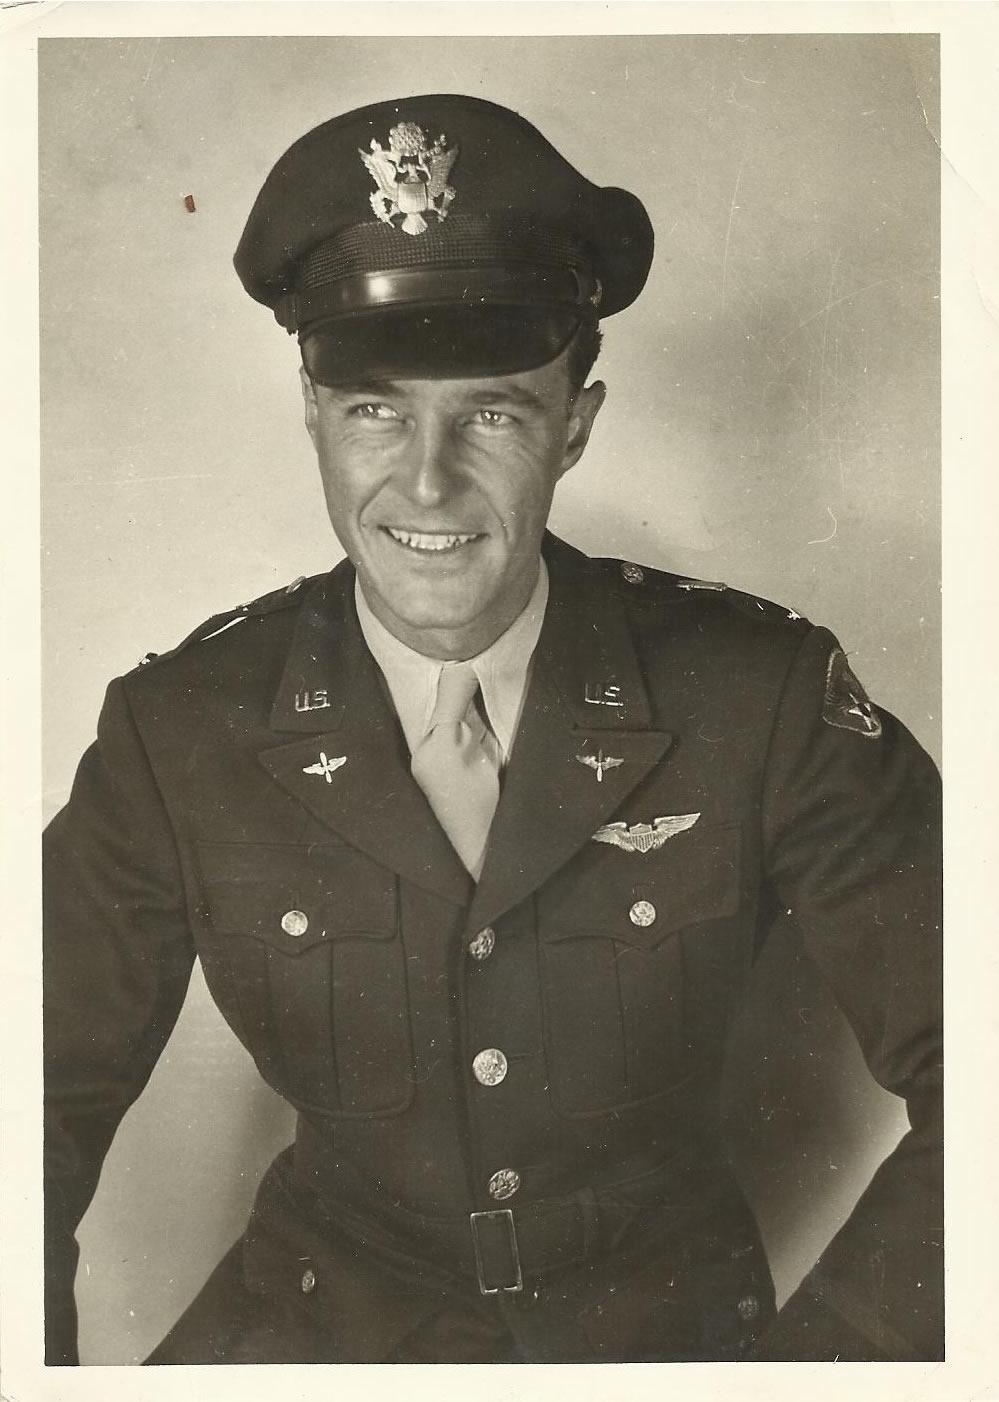 Henry R. Evans